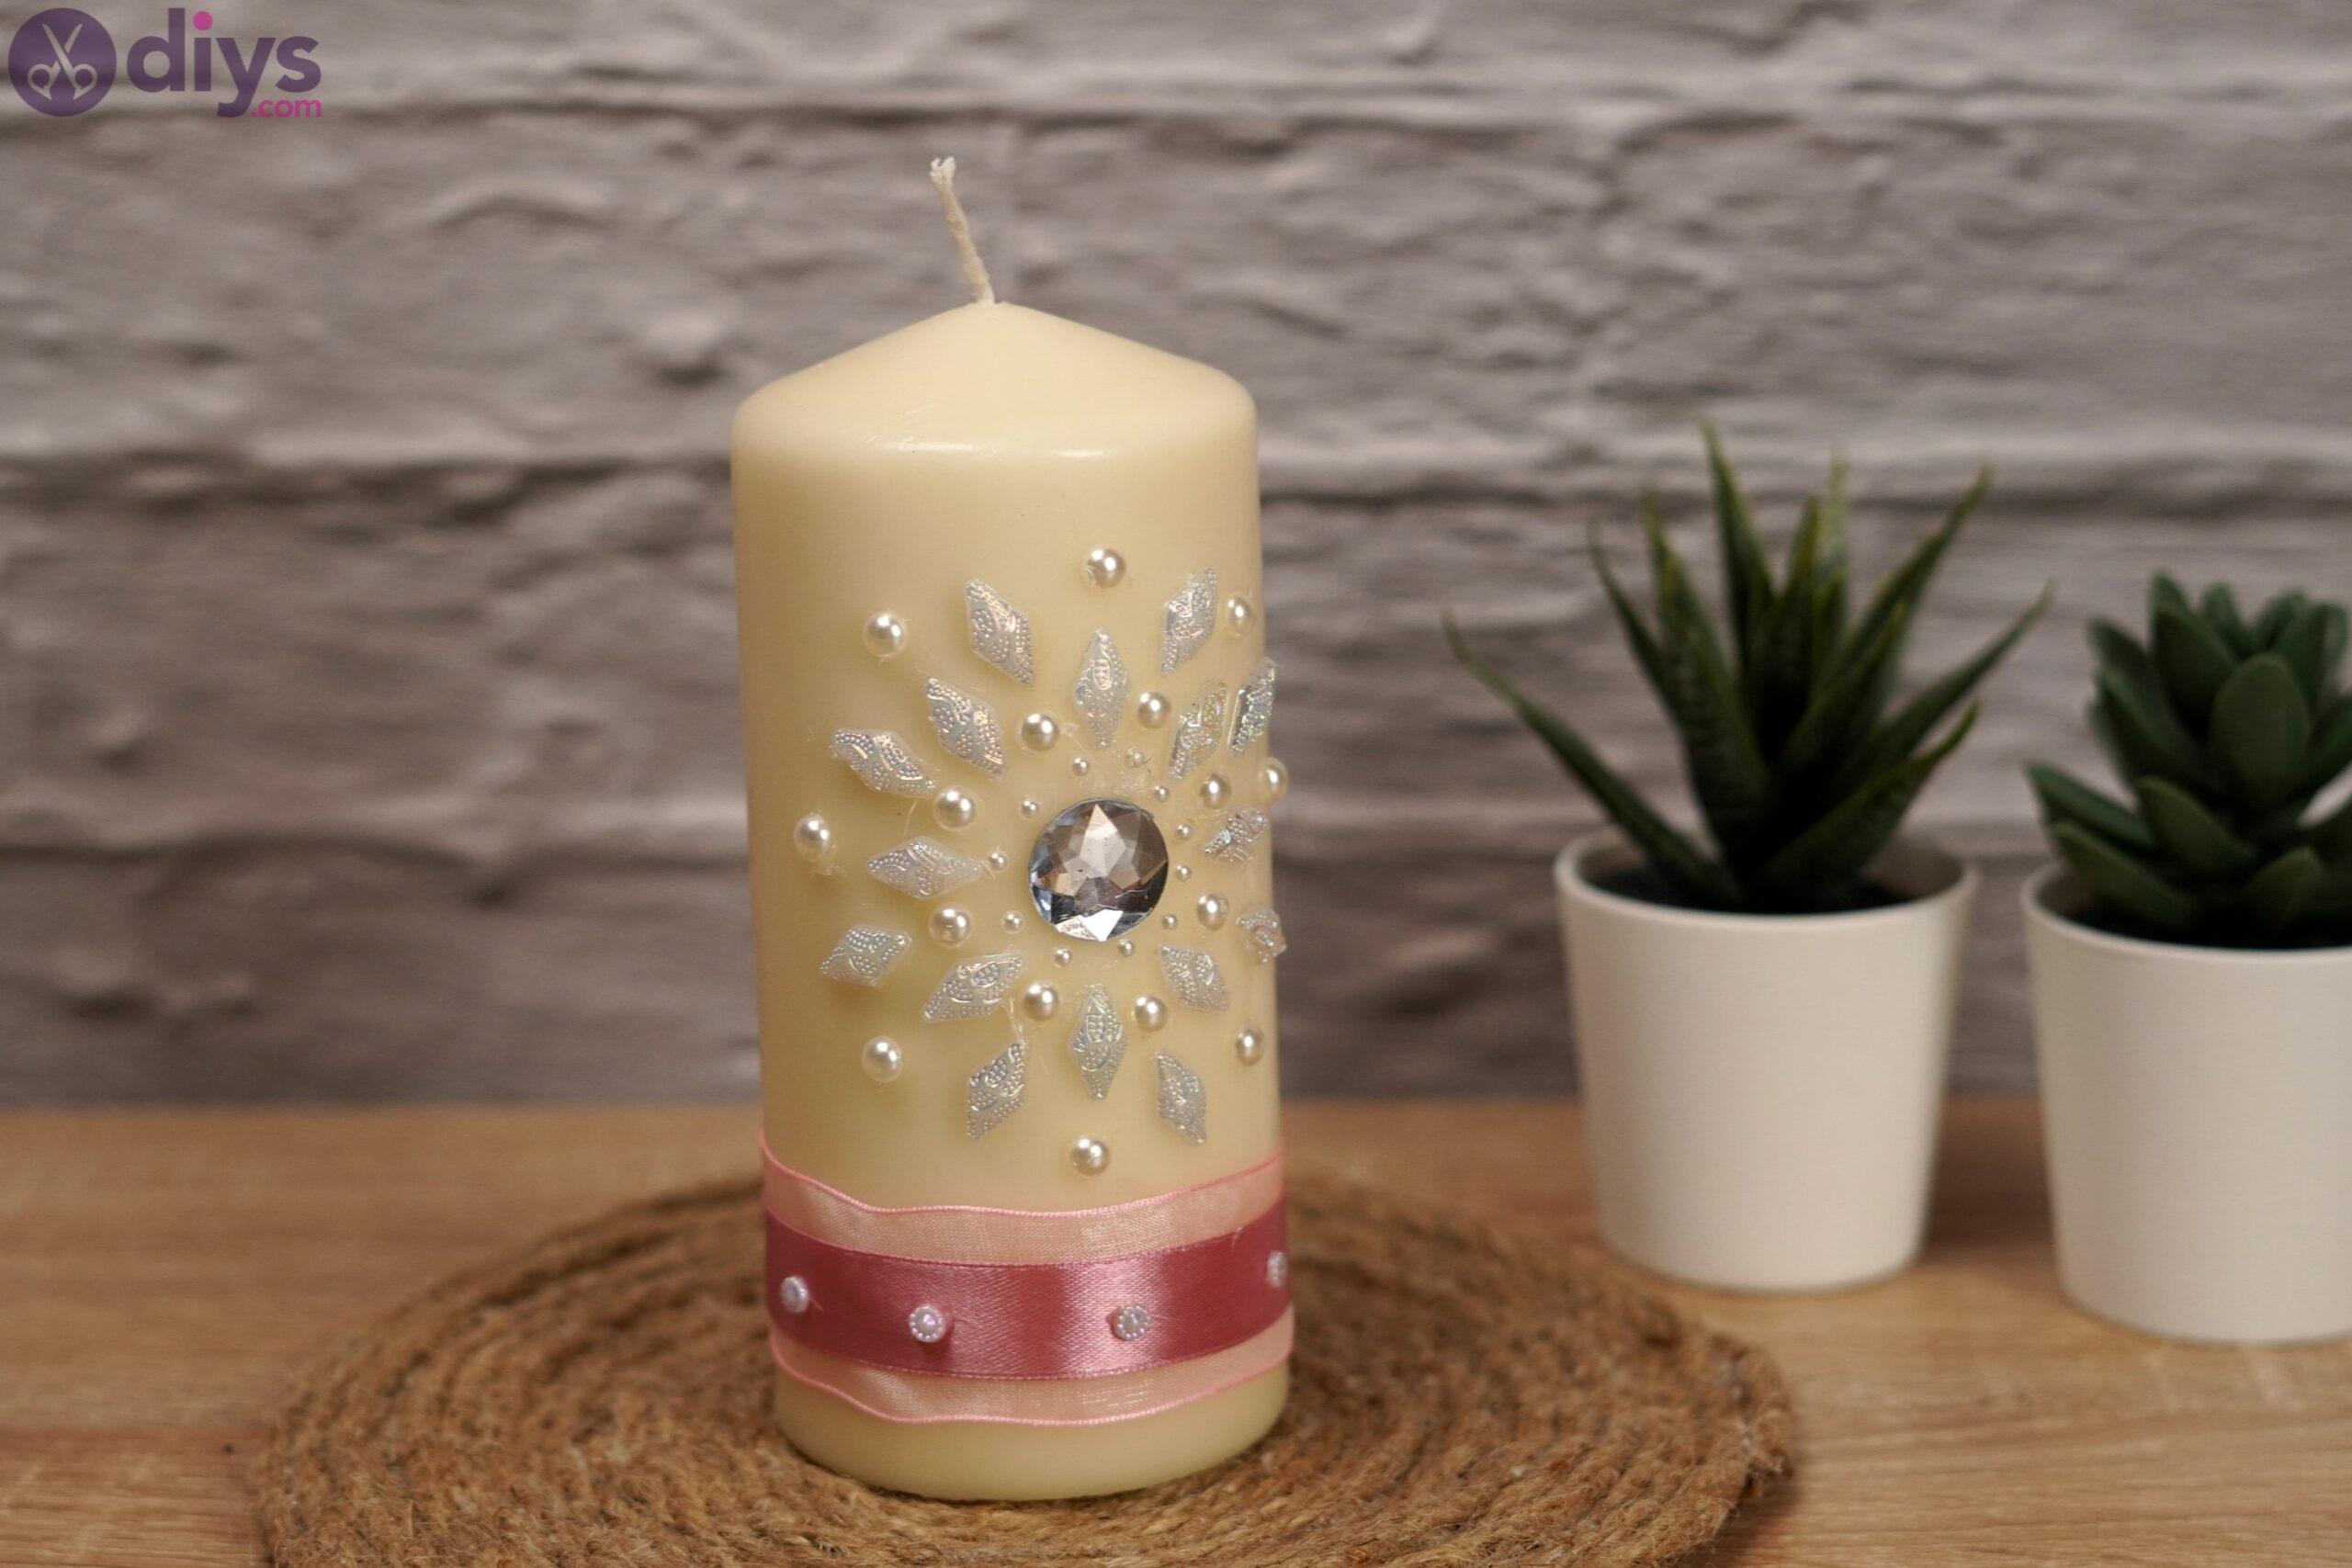 Diy candle art (5)